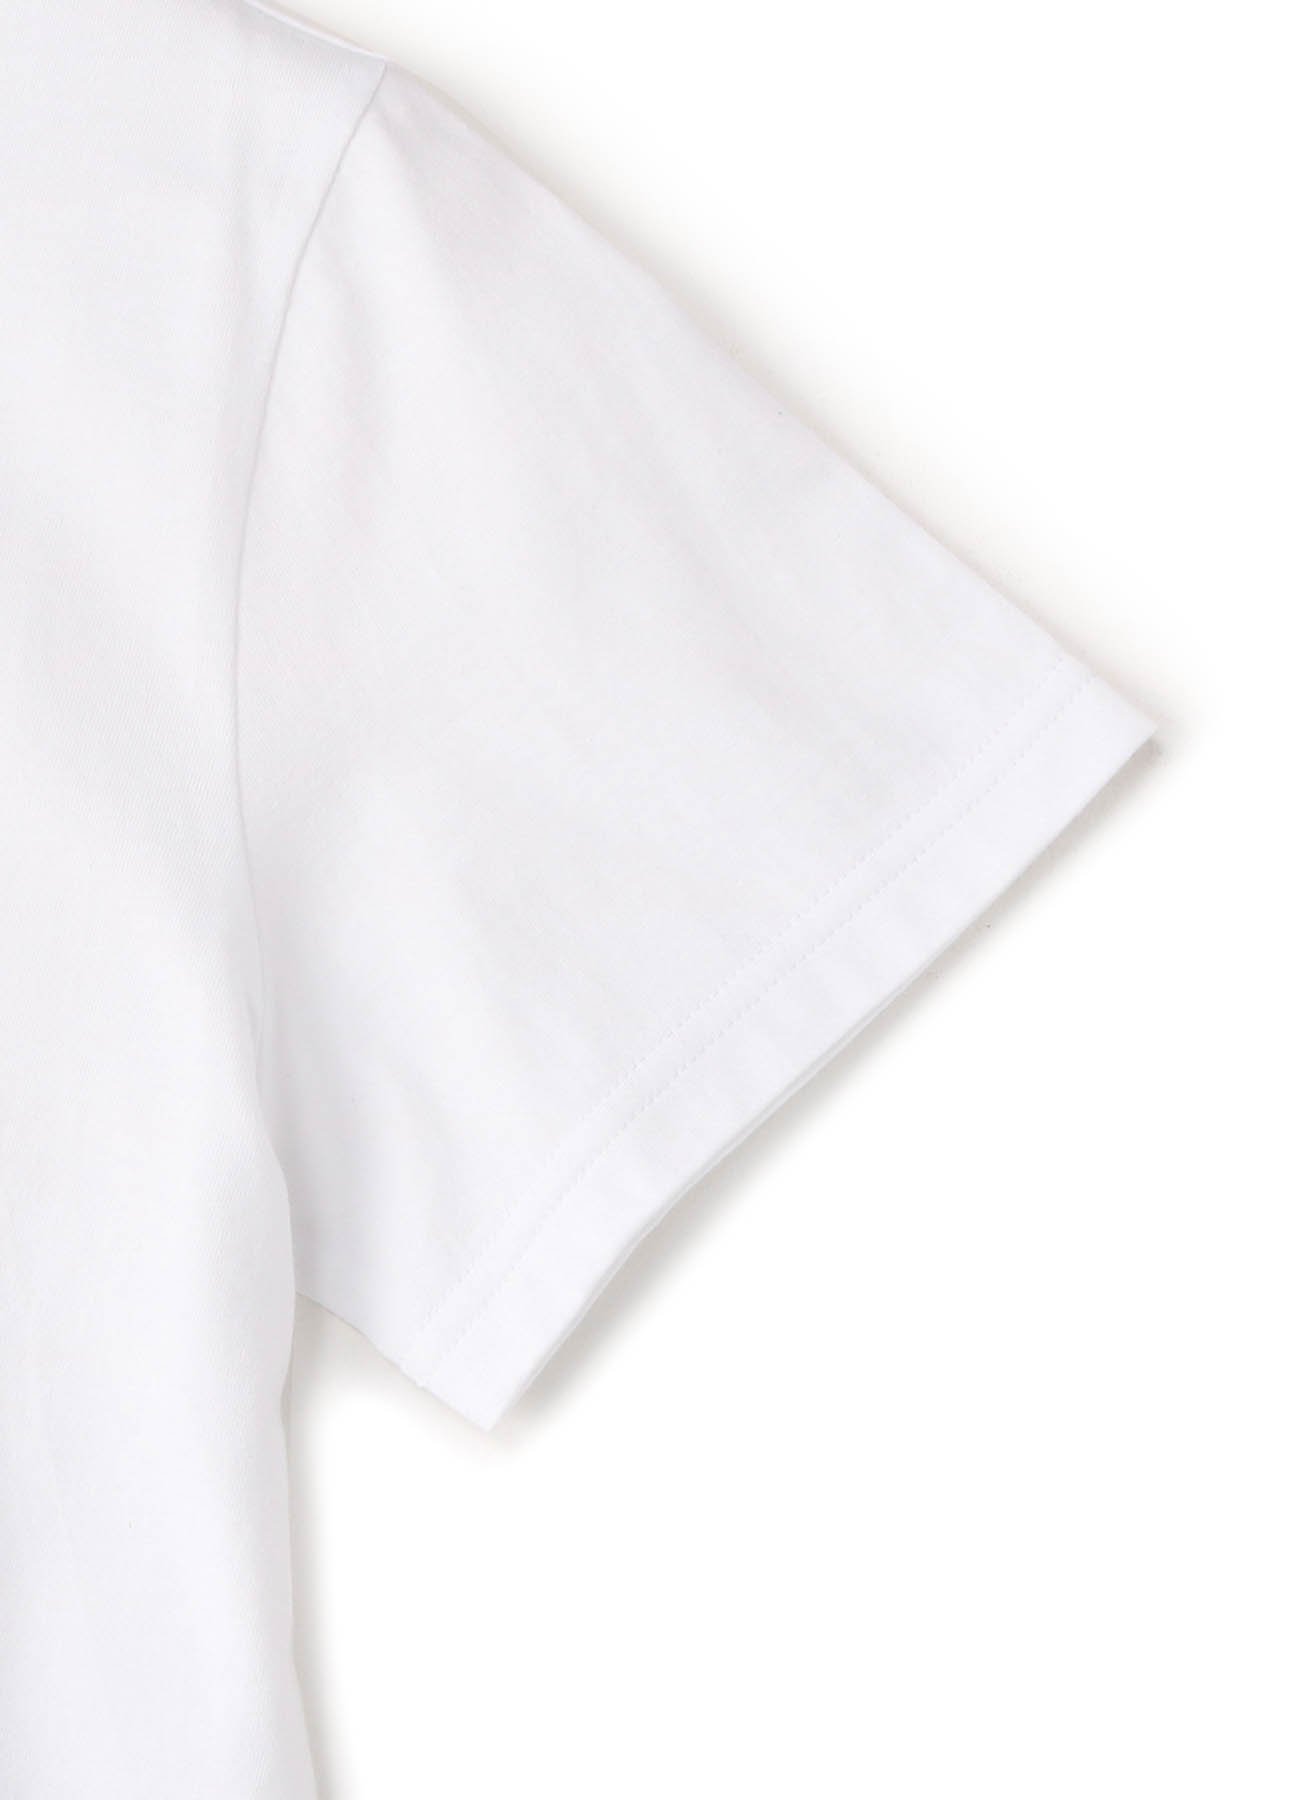 30/Cotton Jersey Fringe Cut Sew